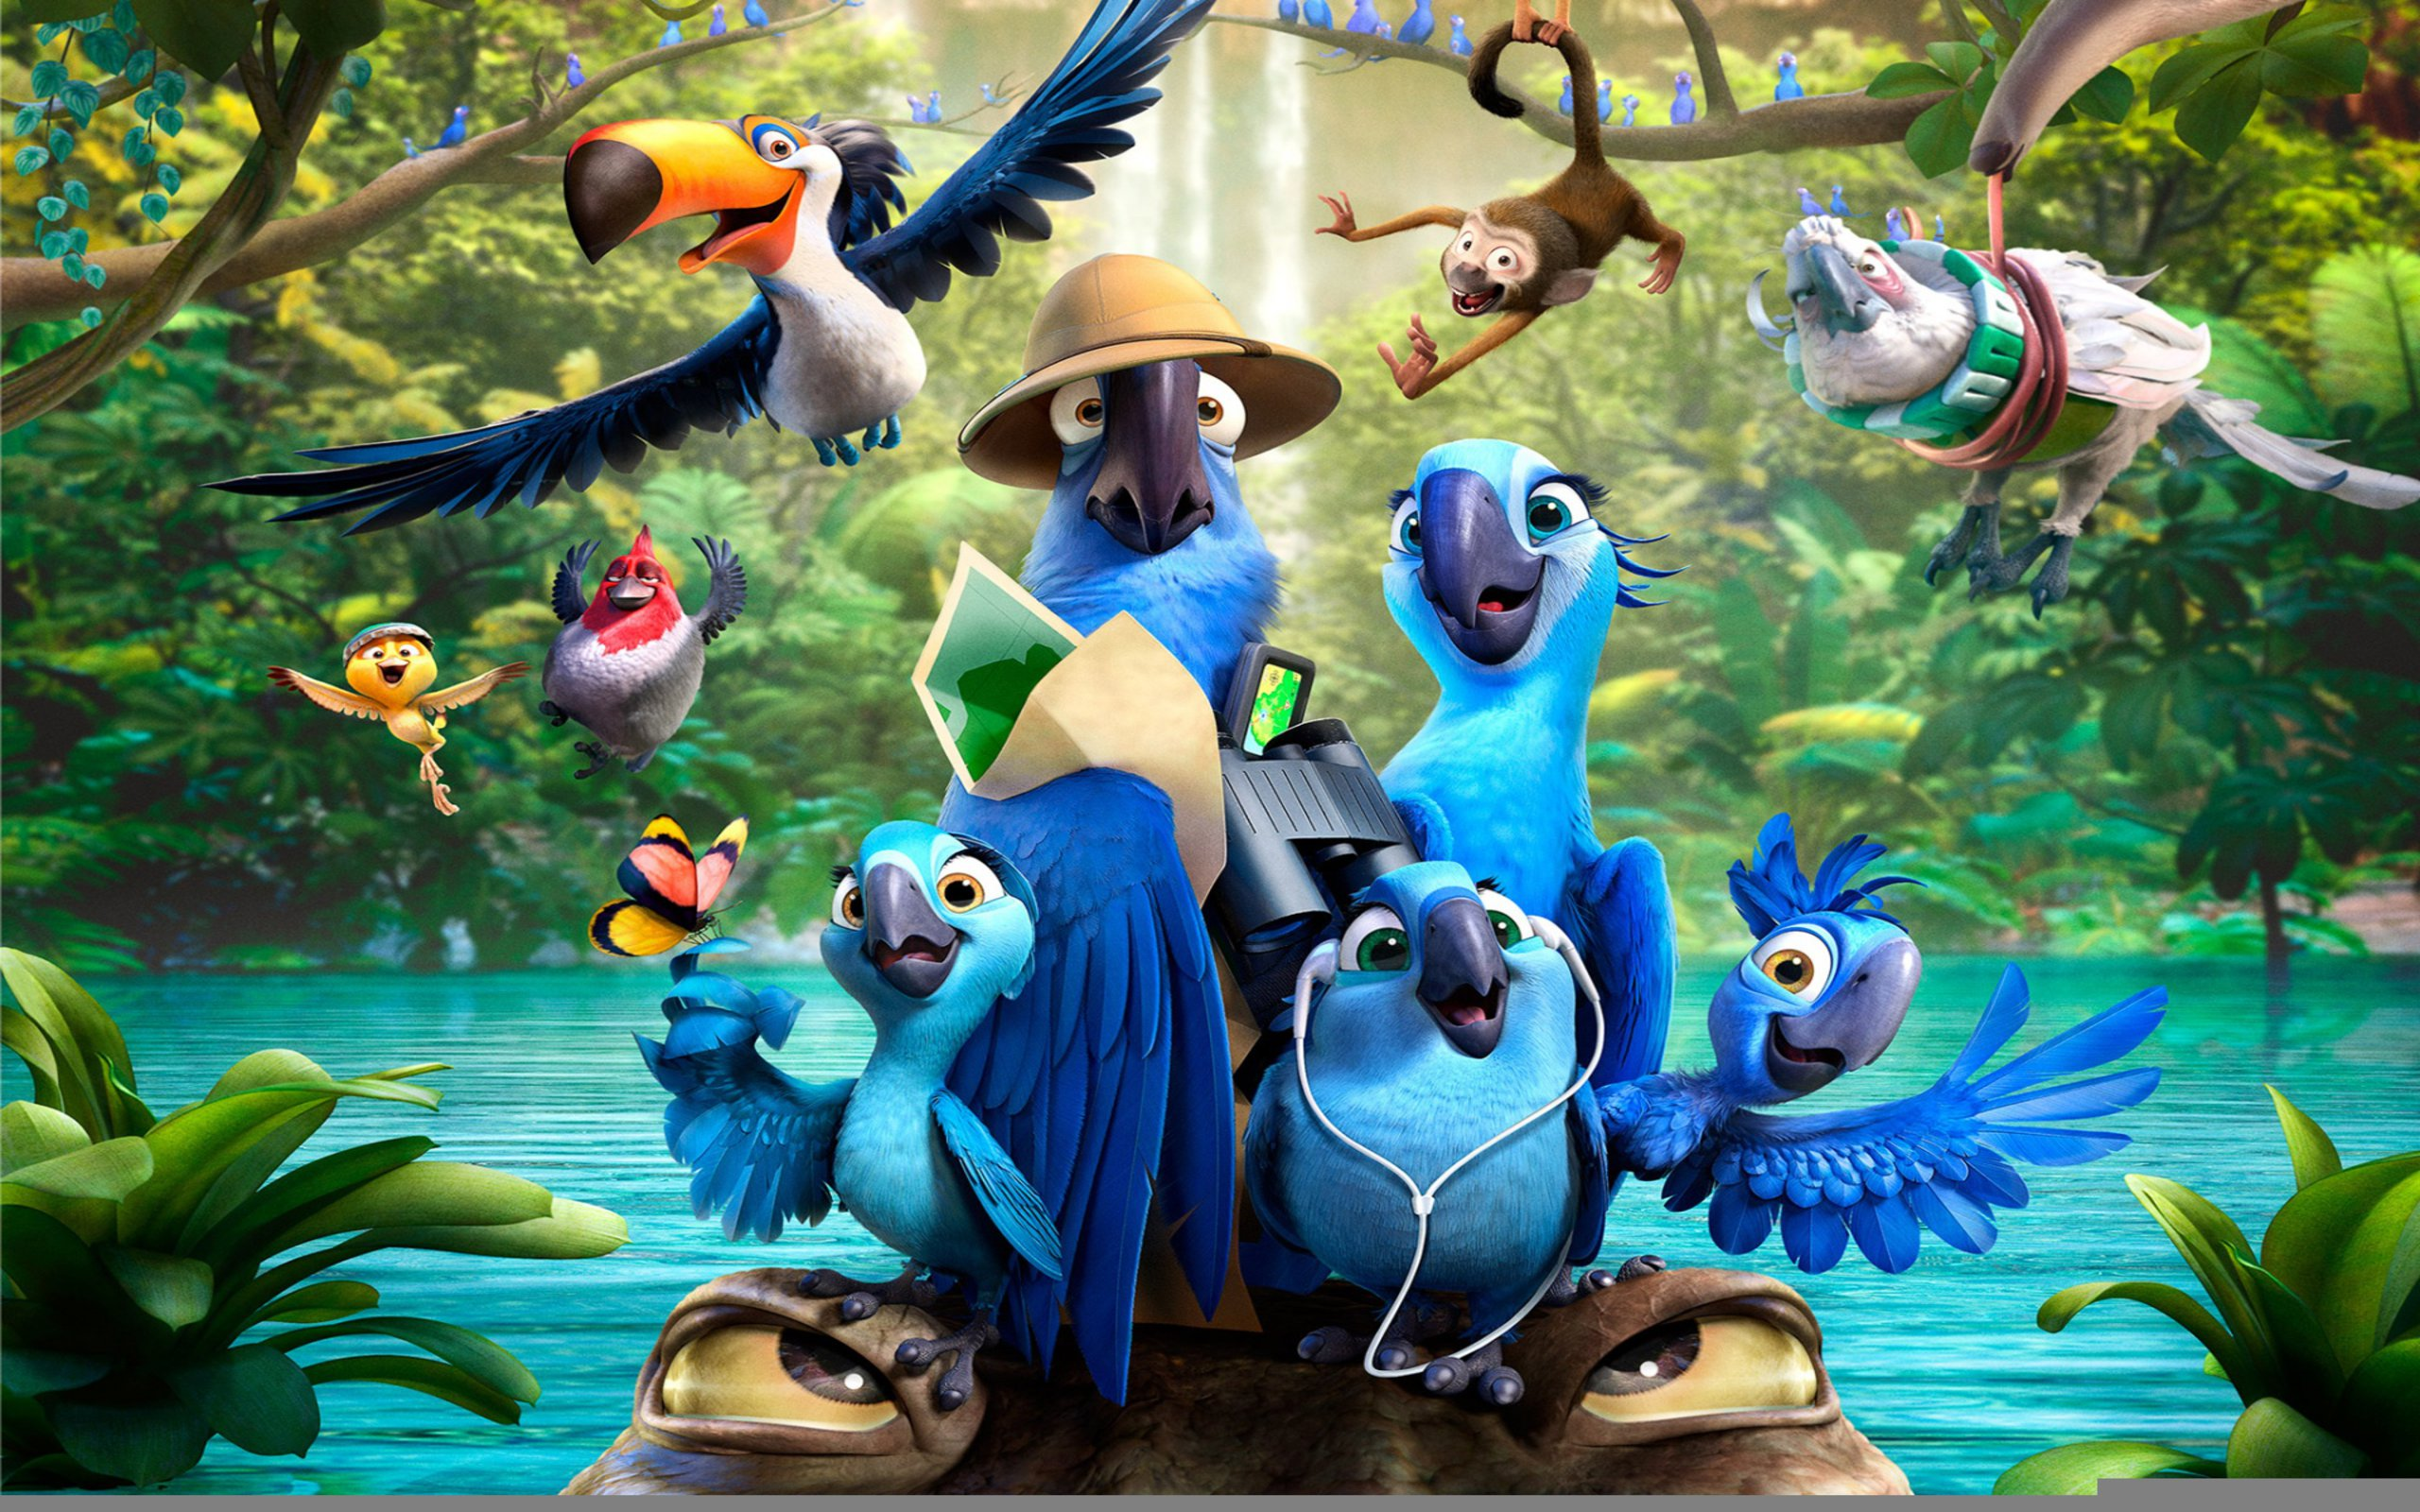 Free Full Cartoon Movies rio 2 cartoon movie wallpaper | 2560x1600 | #9575